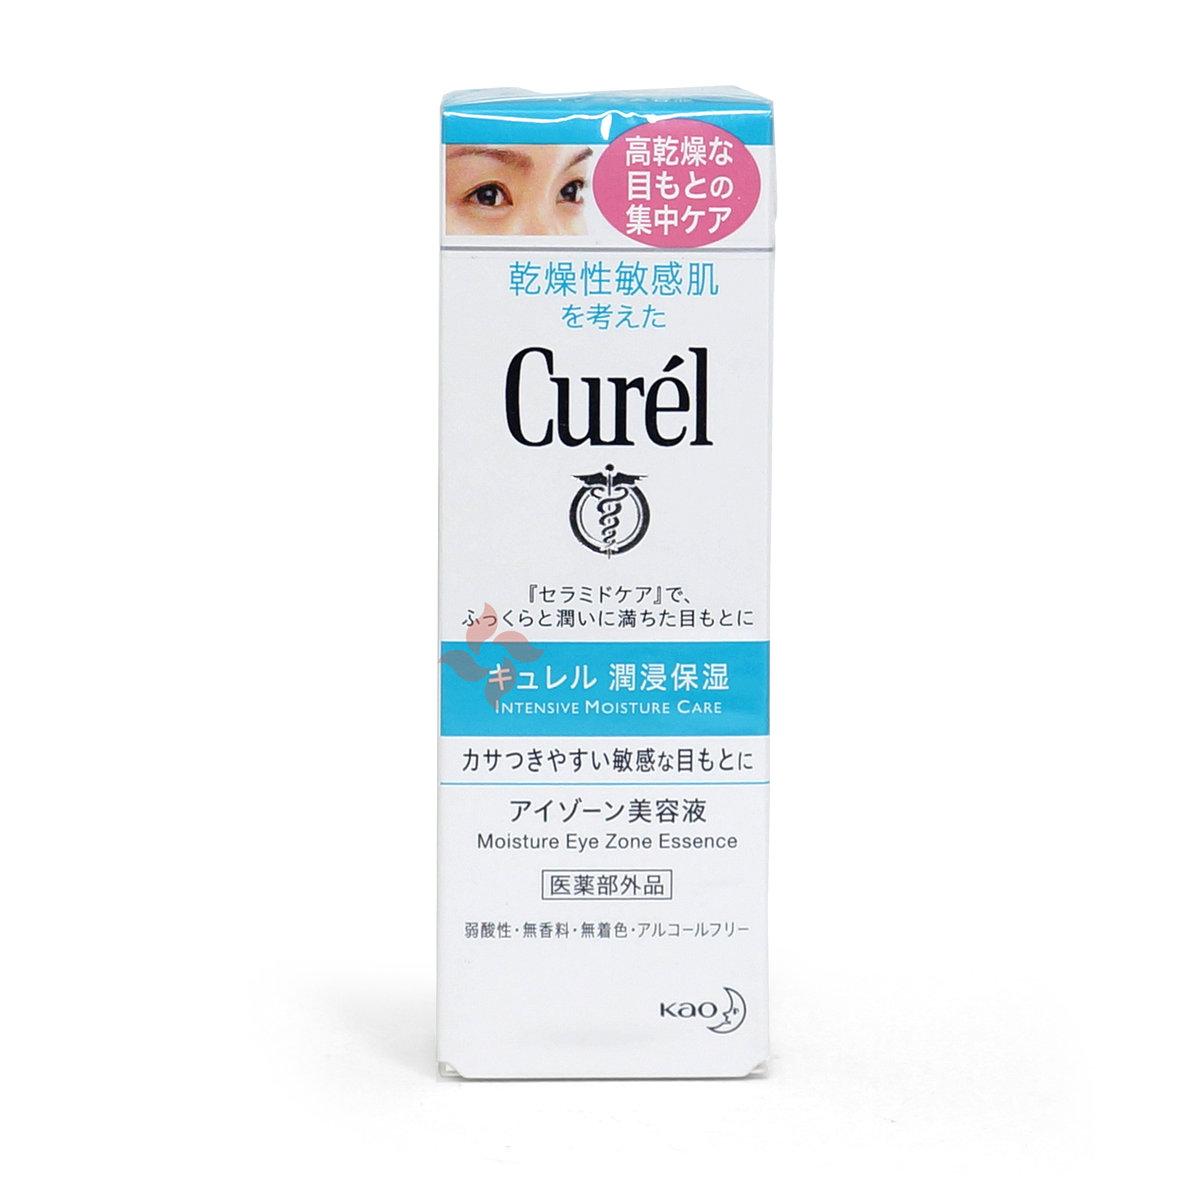 Curel Face Care Serum Moisture Eye Zone Essence (Intensive Moisture Care) 20g(4901301251572)